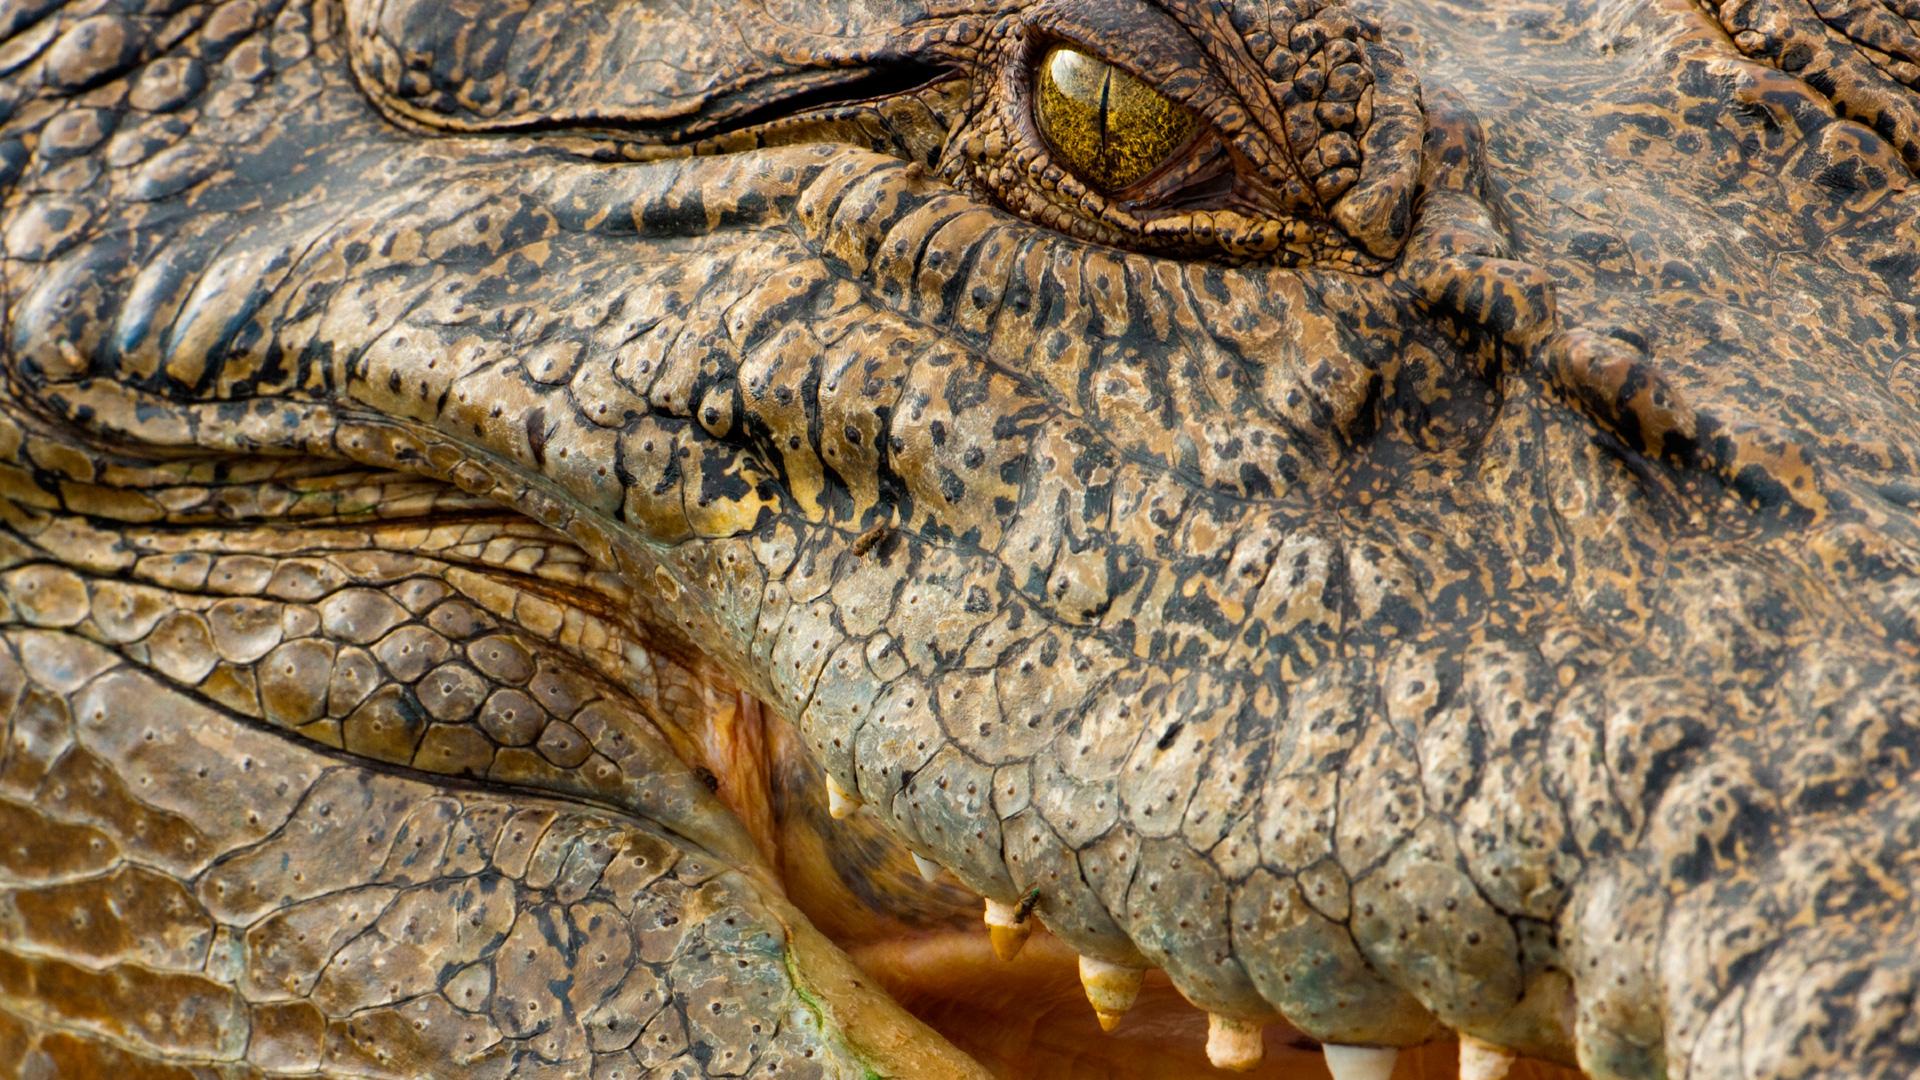 Nova Official Website Deadly Crocodiles Down Under